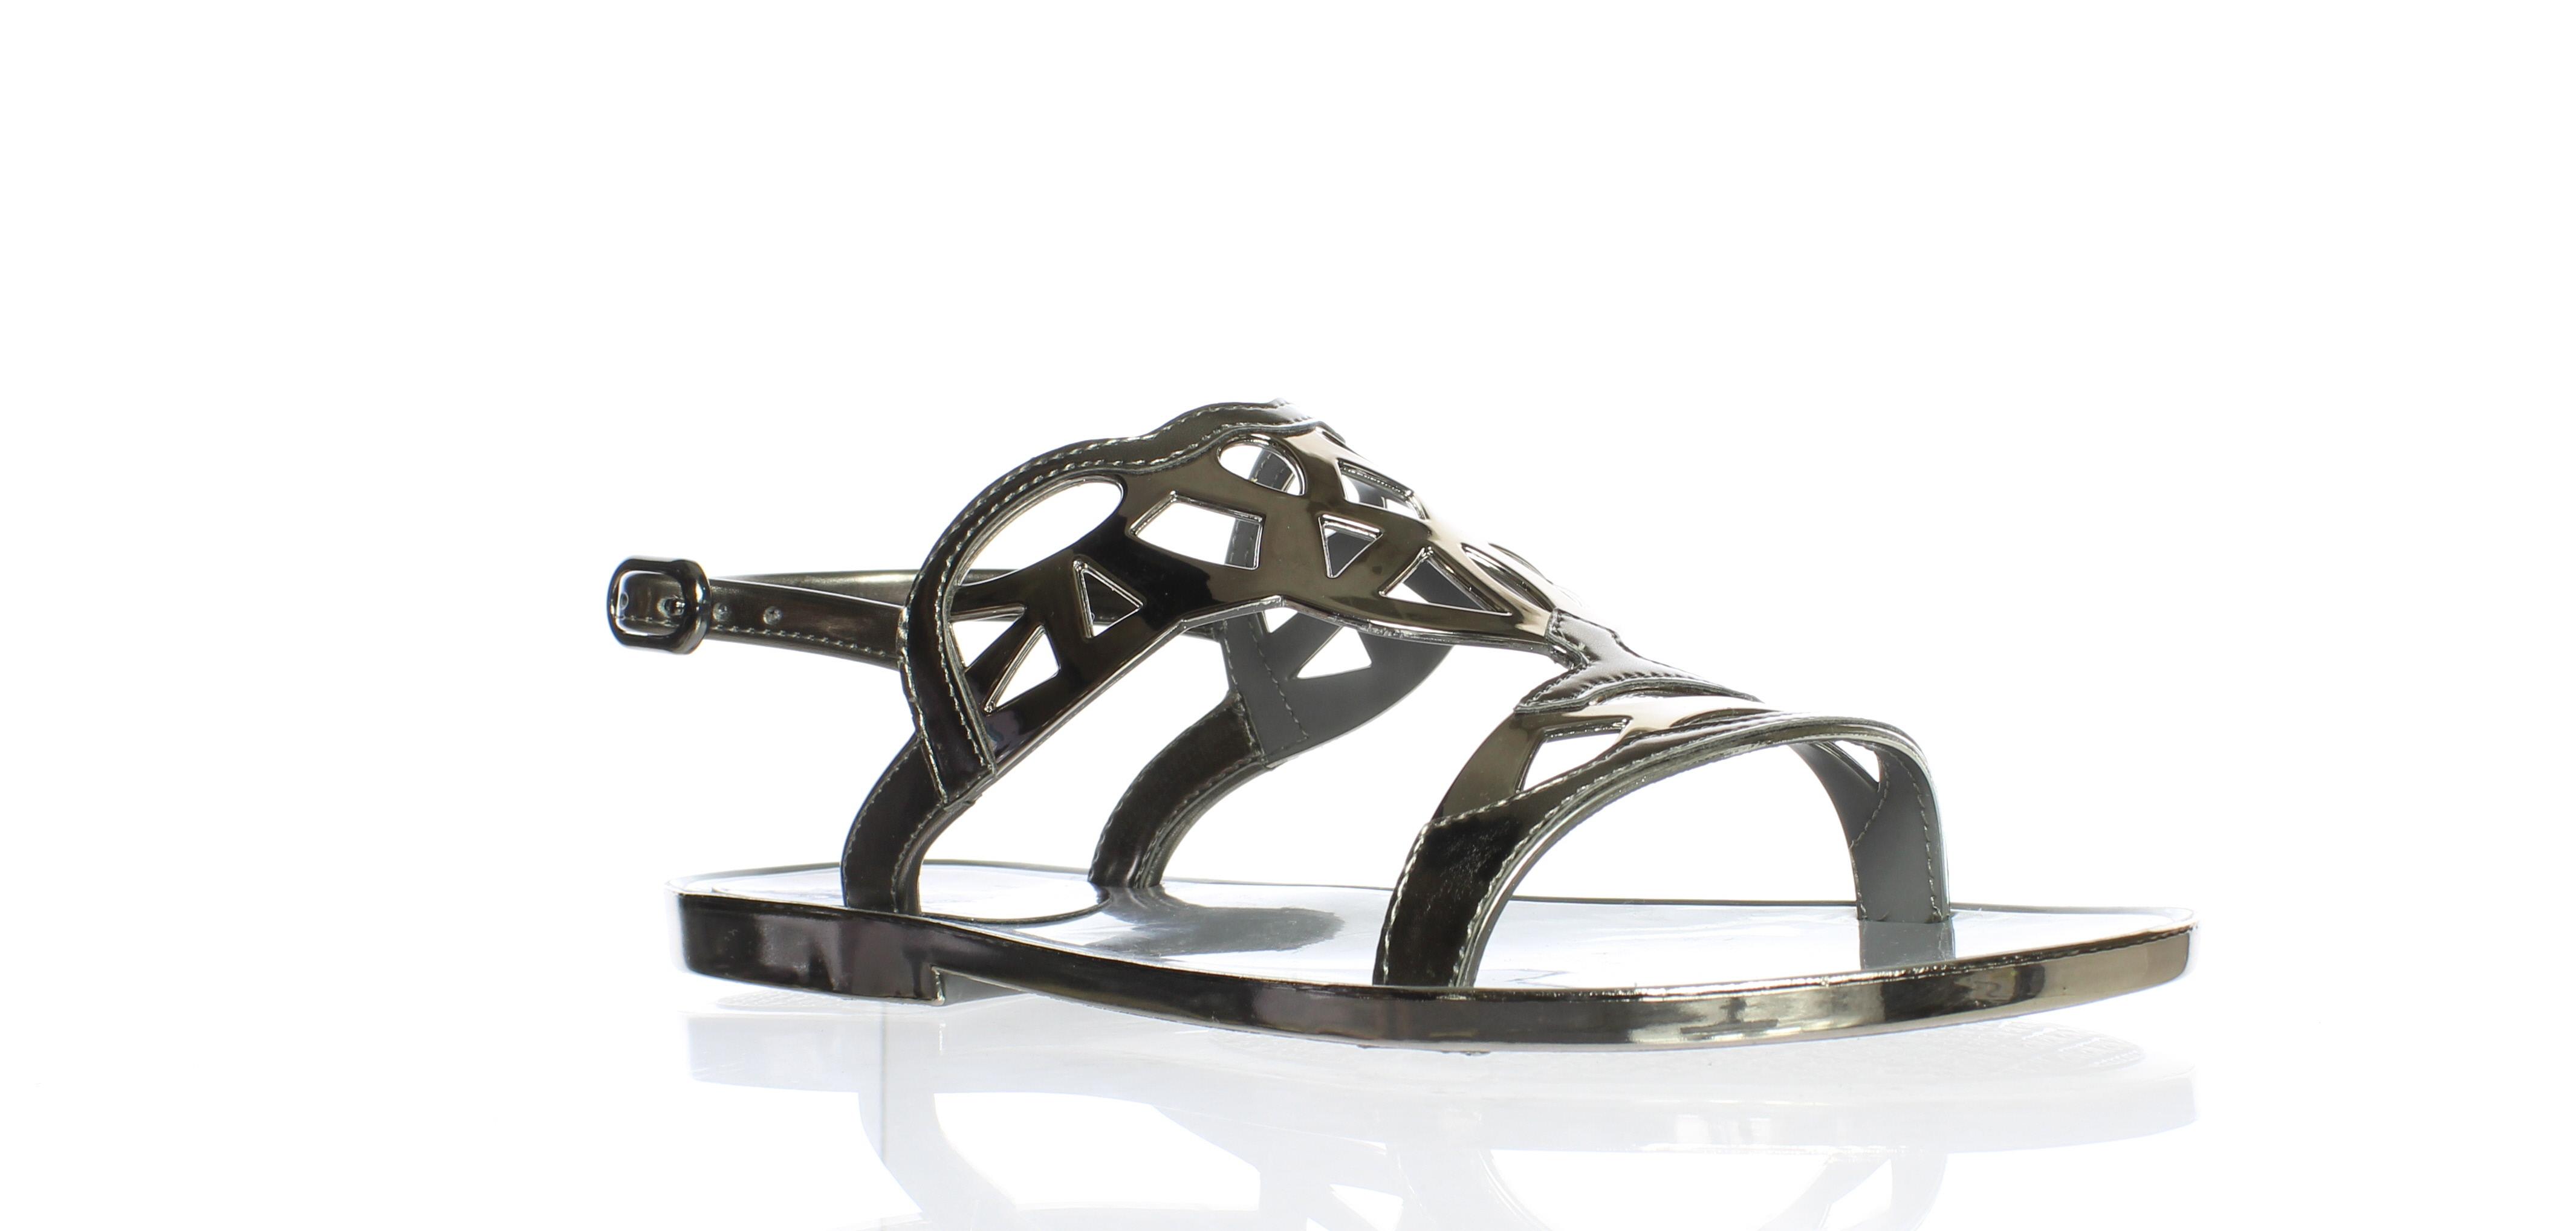 758df9b6dfb4 New Stuart Weitzman Womens Gelfisher Graphite Ankle Strap Flats Size 5